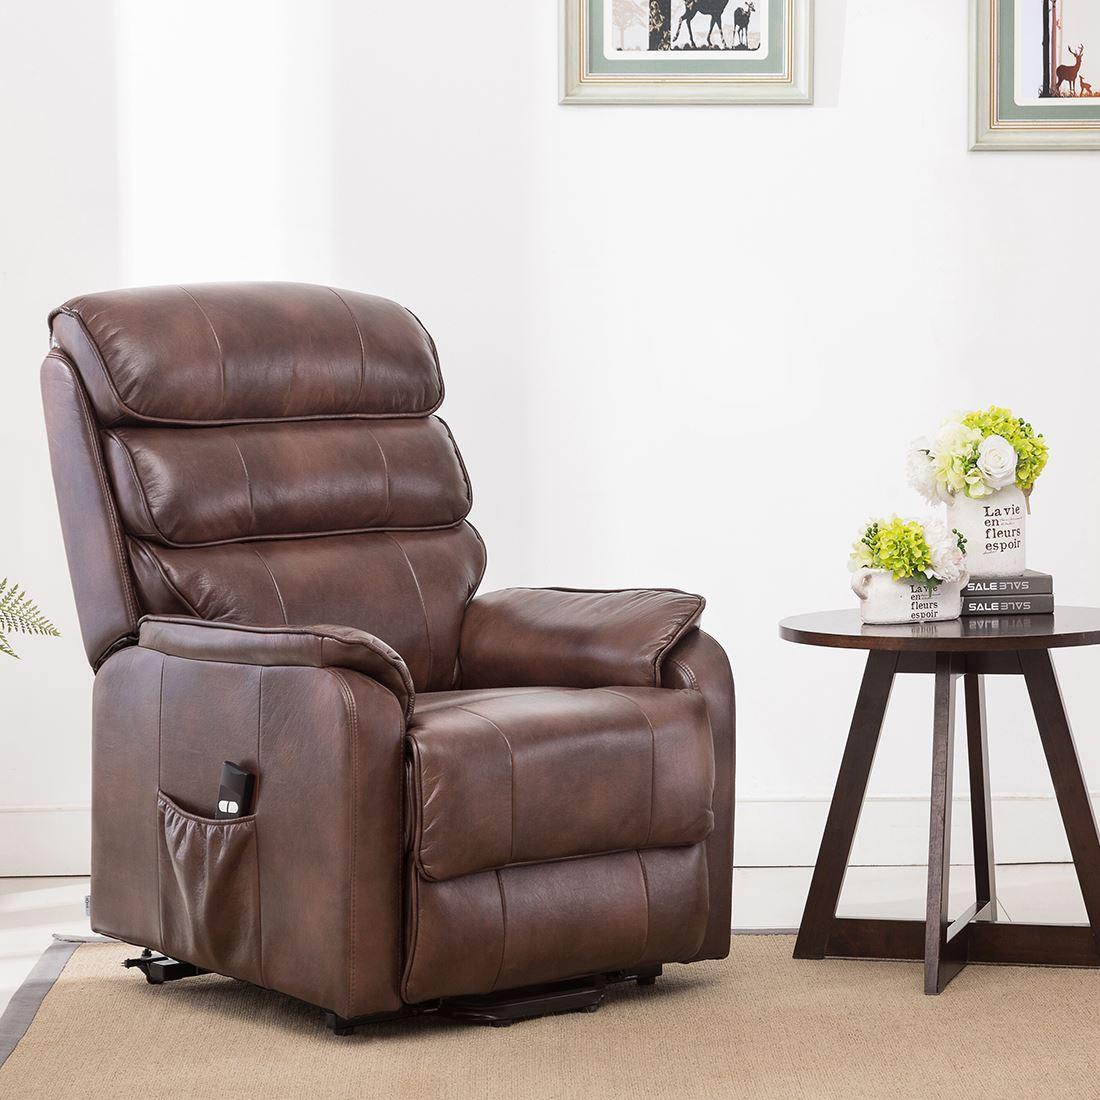 Pleasing Details About Buckingham Electric Rise Recliner Leather Air Riser Sofa Armchair Lounge Chair Creativecarmelina Interior Chair Design Creativecarmelinacom